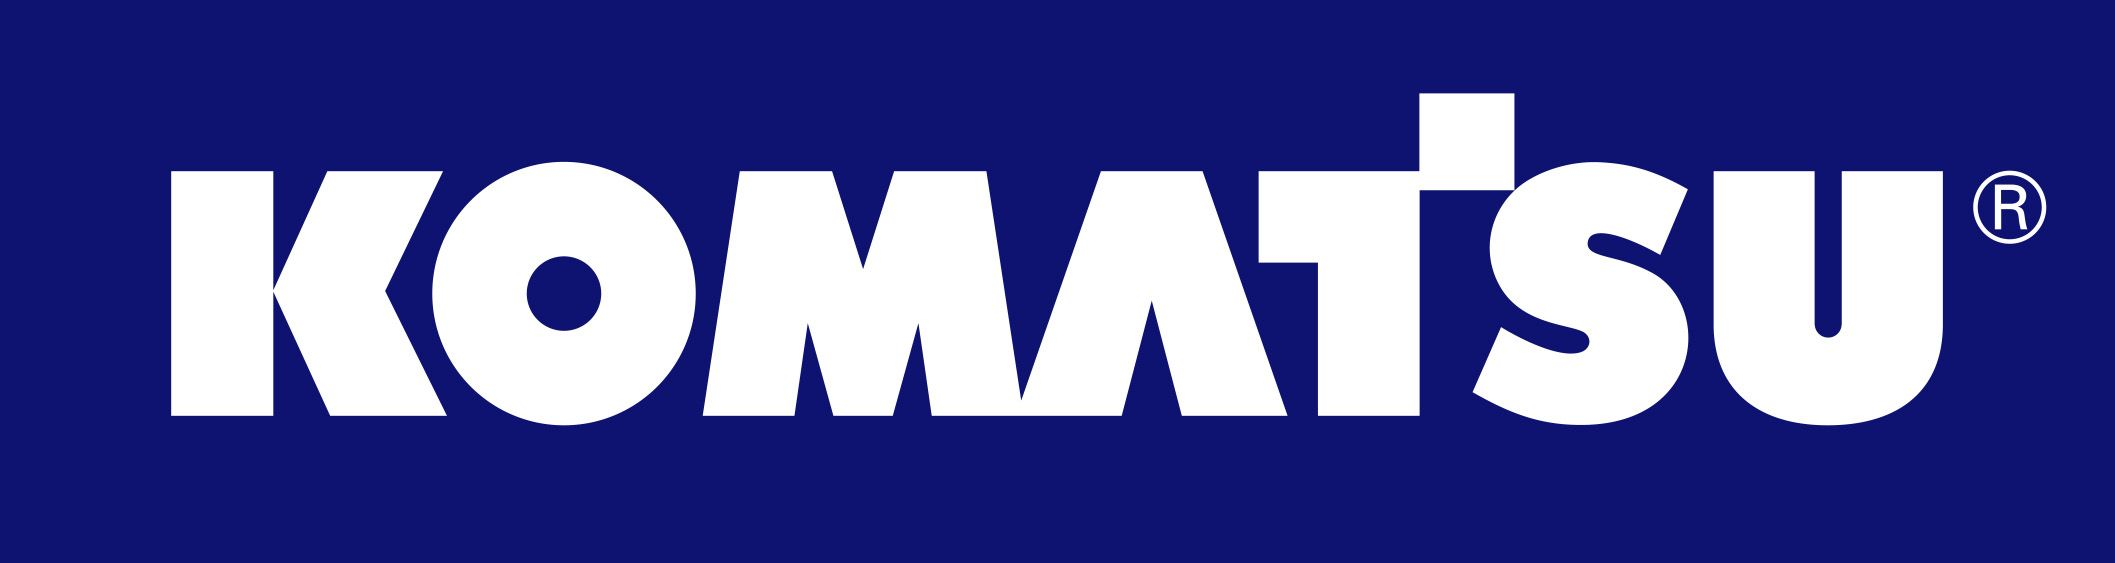 Resultado de imagen para logos komatsu